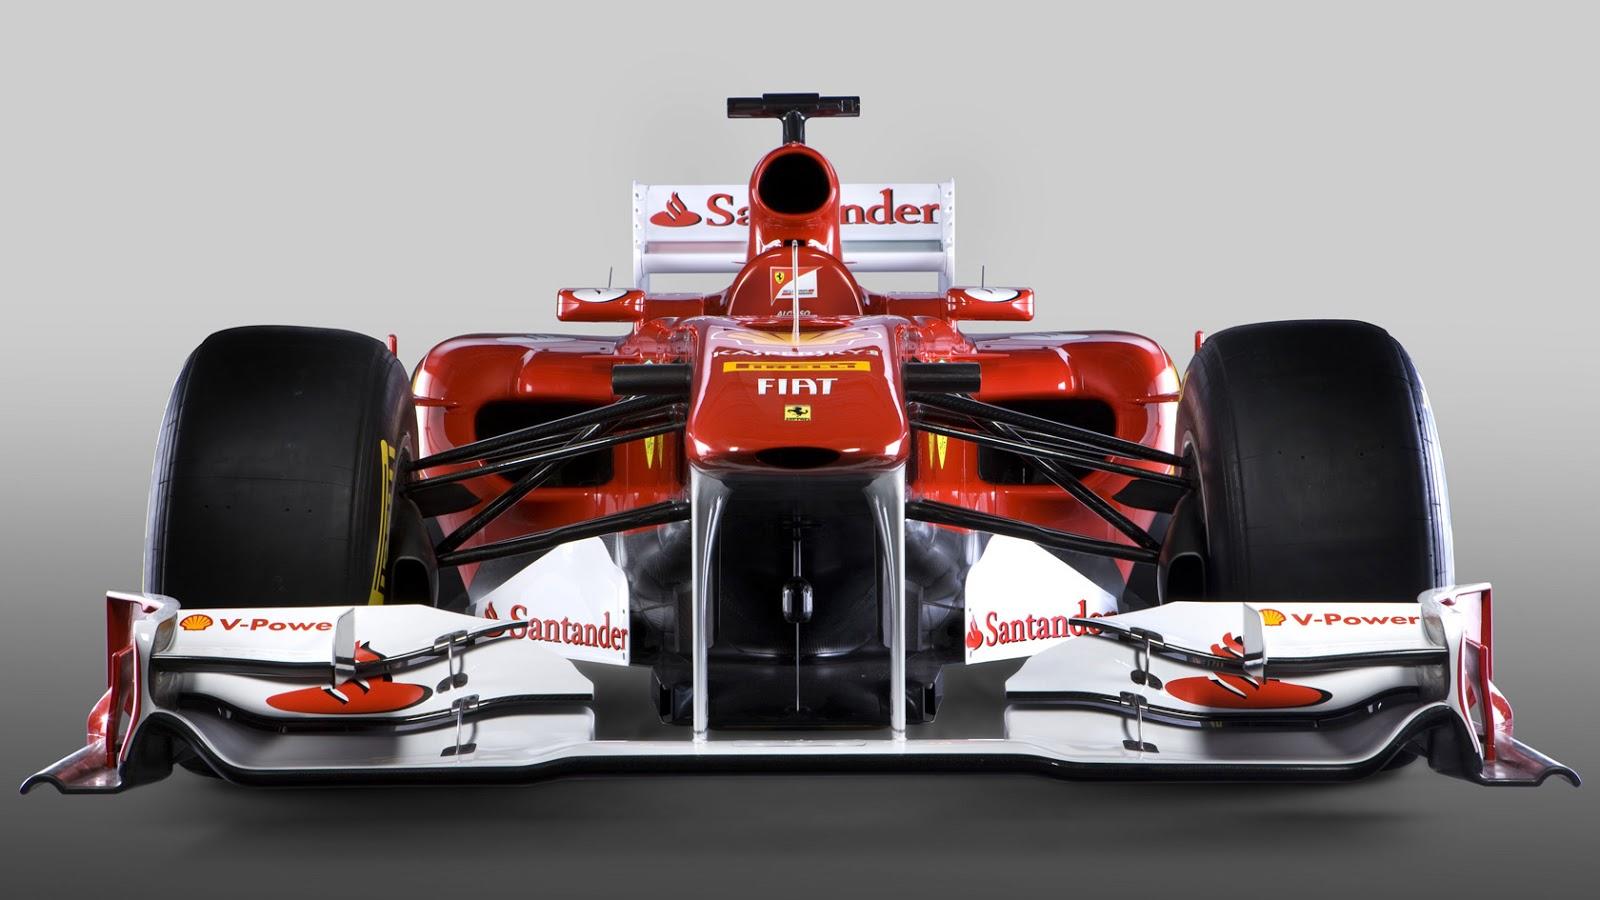 Ferrari f150 2013 images hd cars wallpaper highlight ferrari f150 italia 2013 ferrari f150 italia 2013 vanachro images vanachro Choice Image